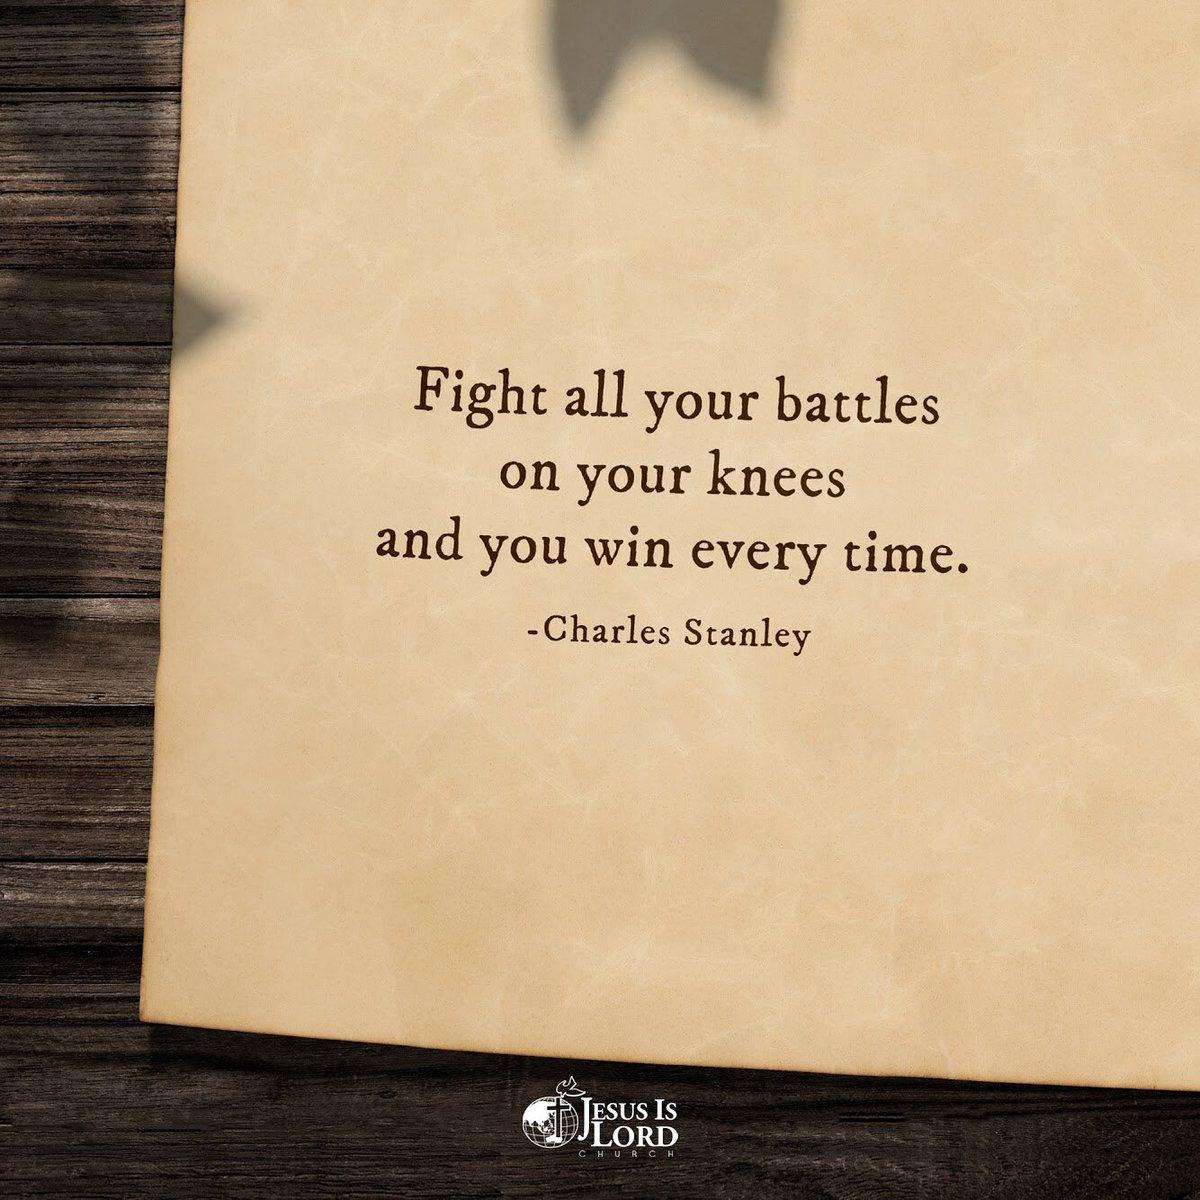 How do you fight your battles? #Jesus #JIL #JesusIsLord #JILChurch #JILWorldwide #JILCW2019 #JesusIsLordOverMyBattles<br>http://pic.twitter.com/mzloKCAWgU